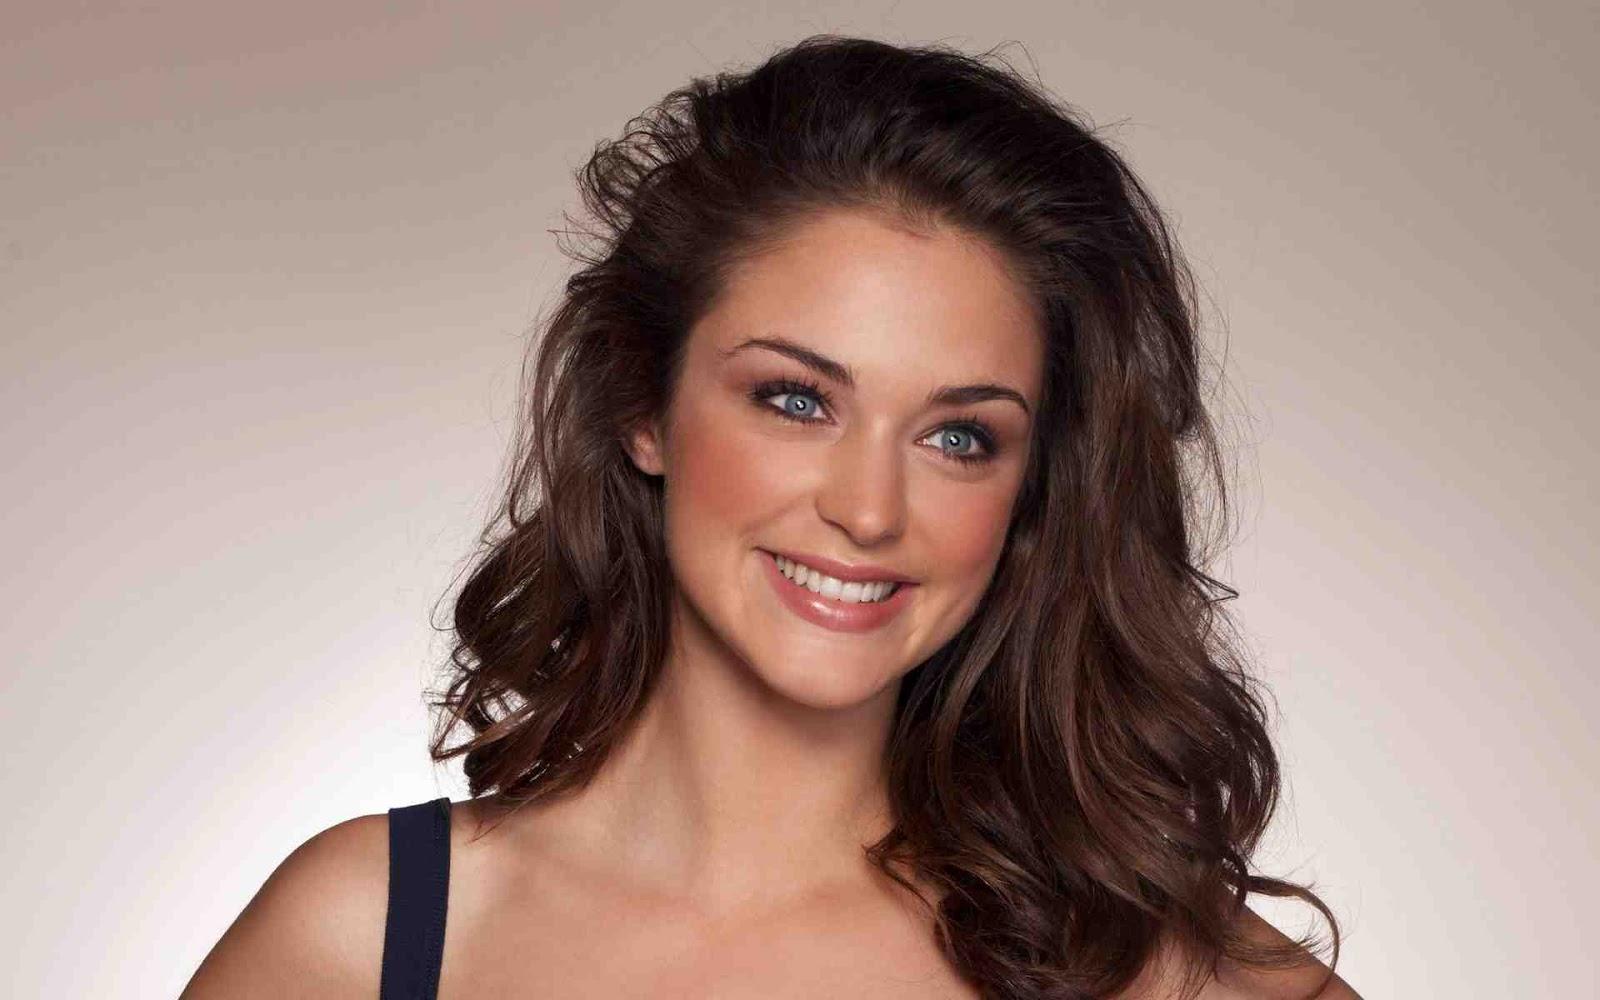 http://1.bp.blogspot.com/-3d8-ZneemOg/TjLImWc-80I/AAAAAAAALNw/3ohUgJuuWeI/s1600/Model-+Lauren-+Budd--29.jpg